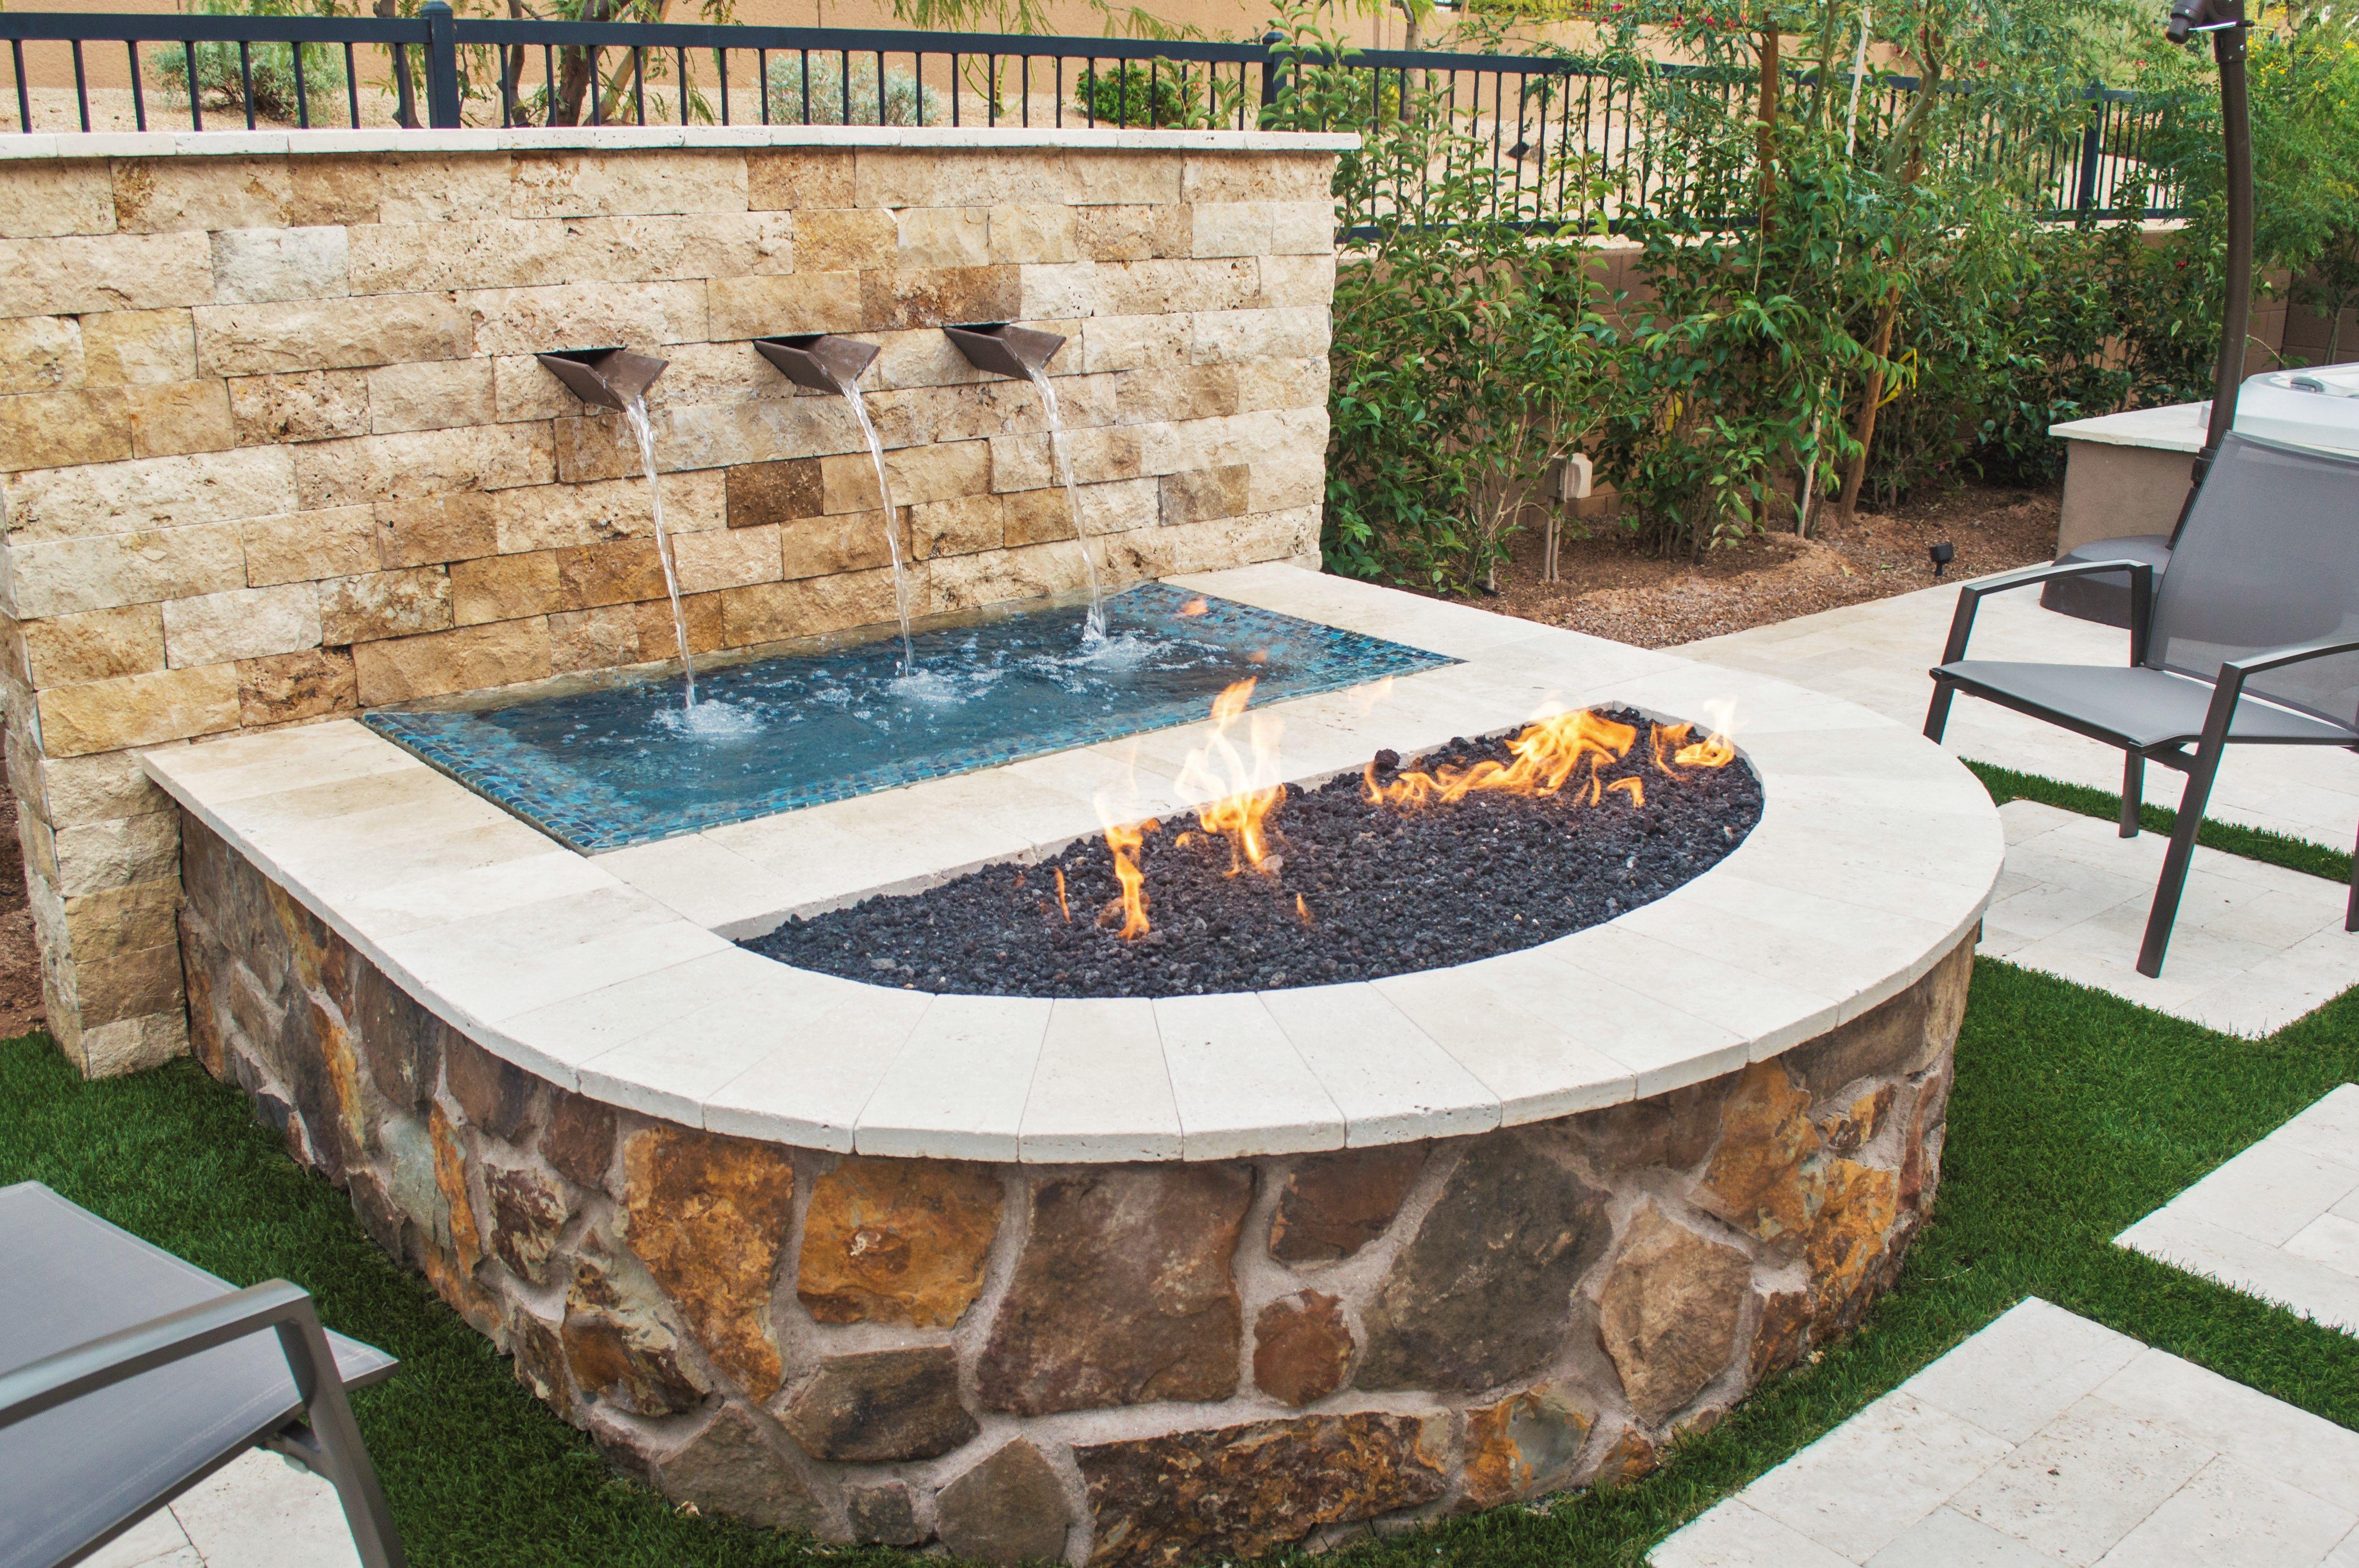 3bd9a1db3d3a84d1f6f9ae9299b02e8b Top Result 49 Luxury Outdoor Tabletop Fireplace Photos 2018 Xzw1